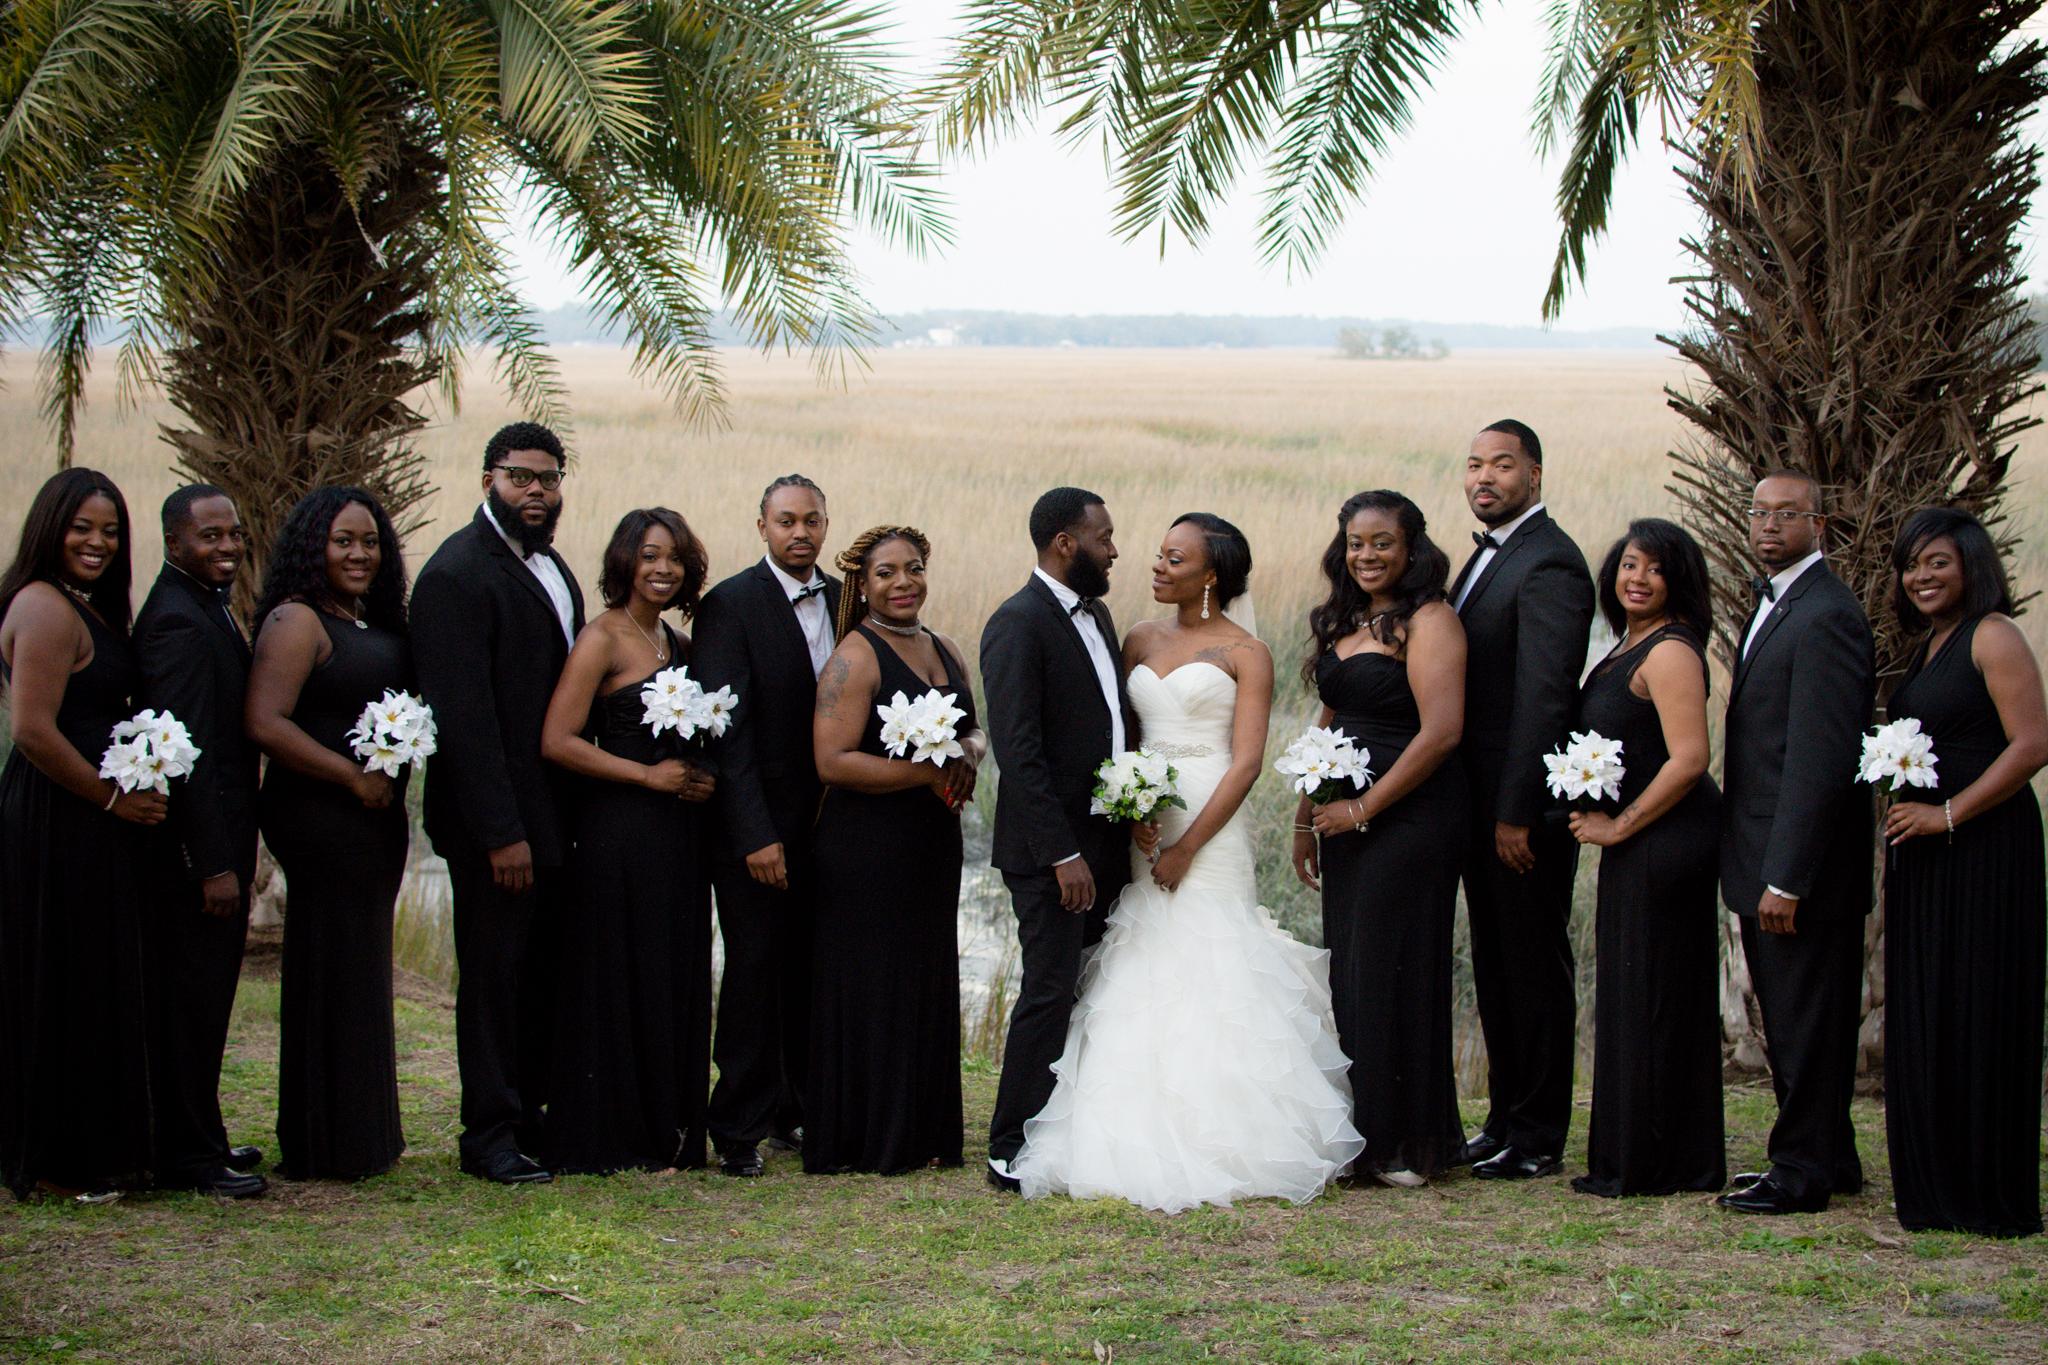 chaplin wedding (110 of 181).JPG